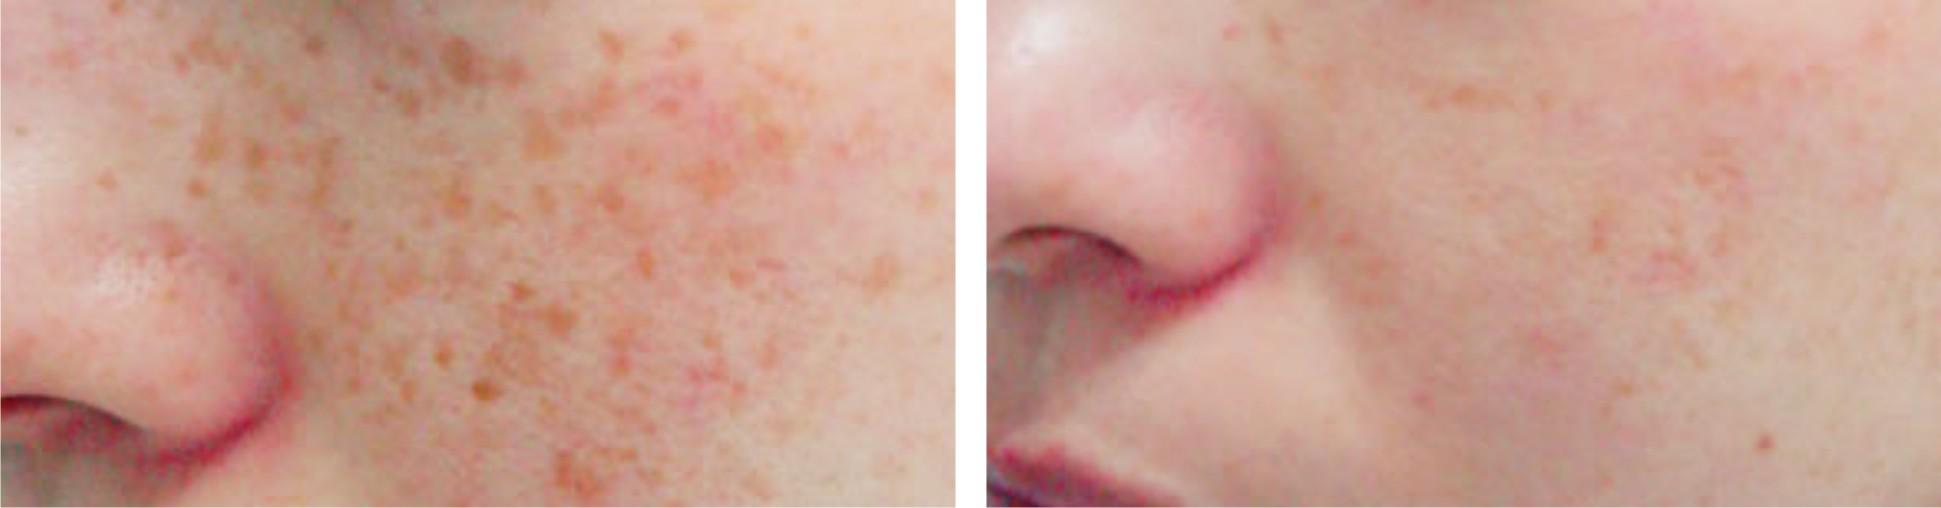 Laser Freckle Removal Image Four